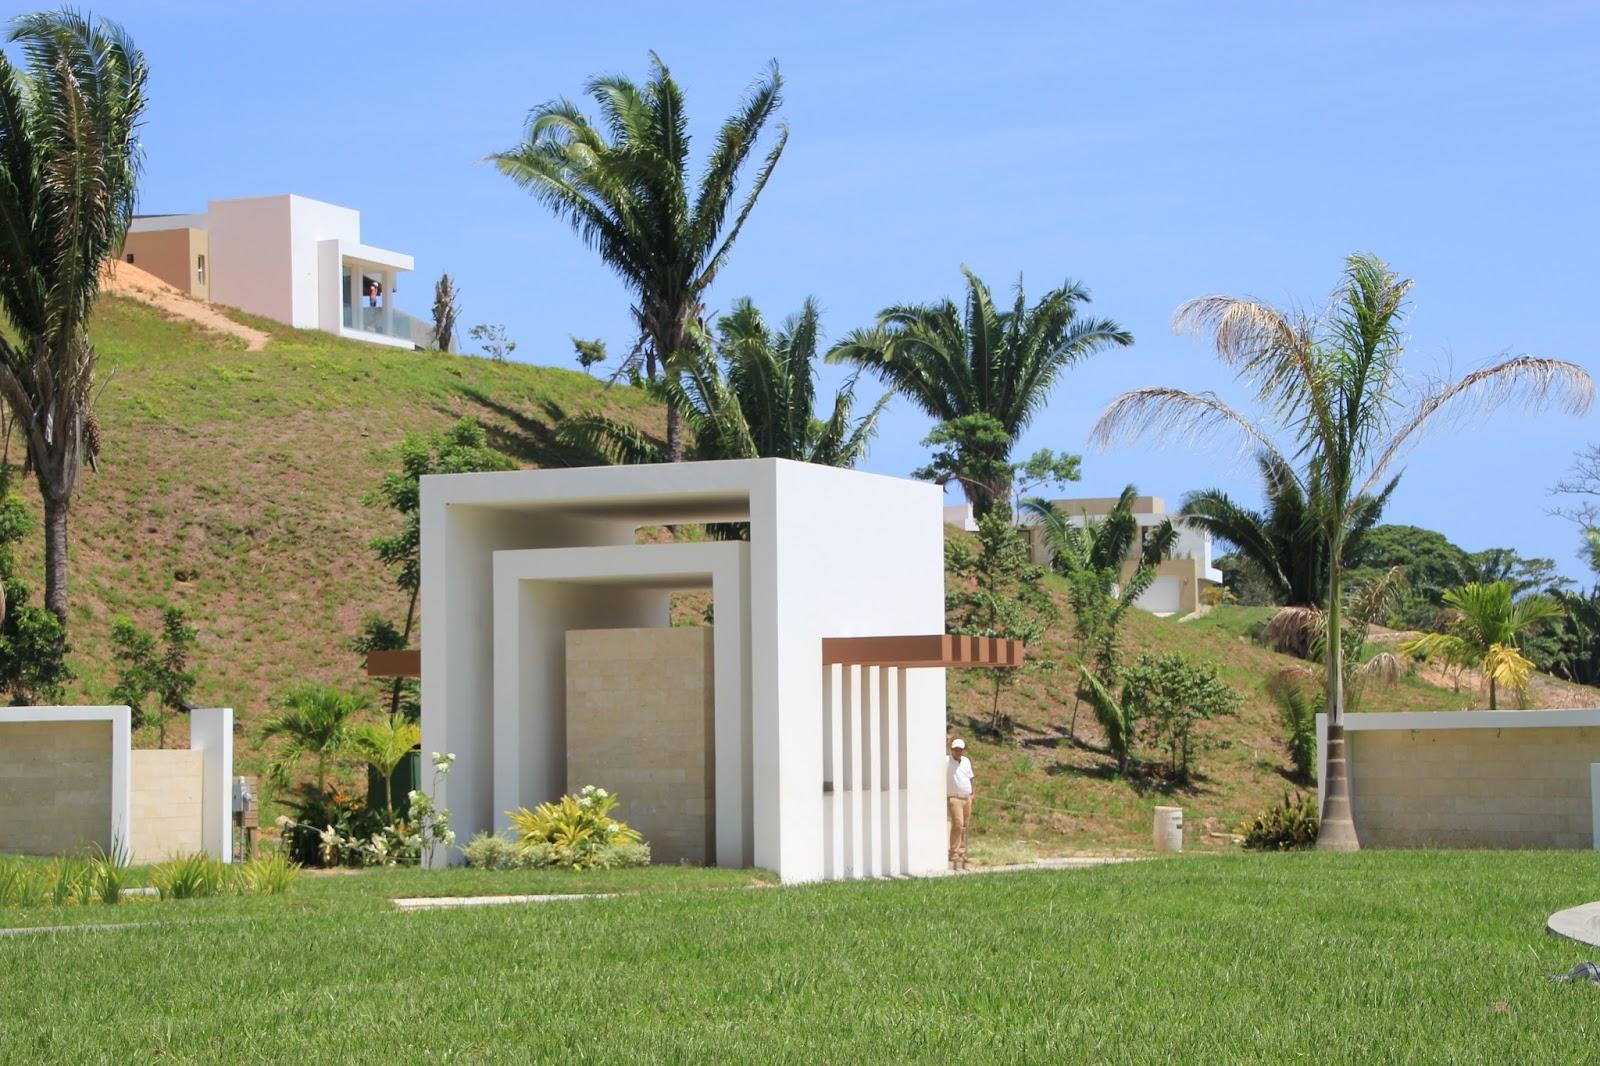 Photo caption: The entrance of NJOI Trujillo.